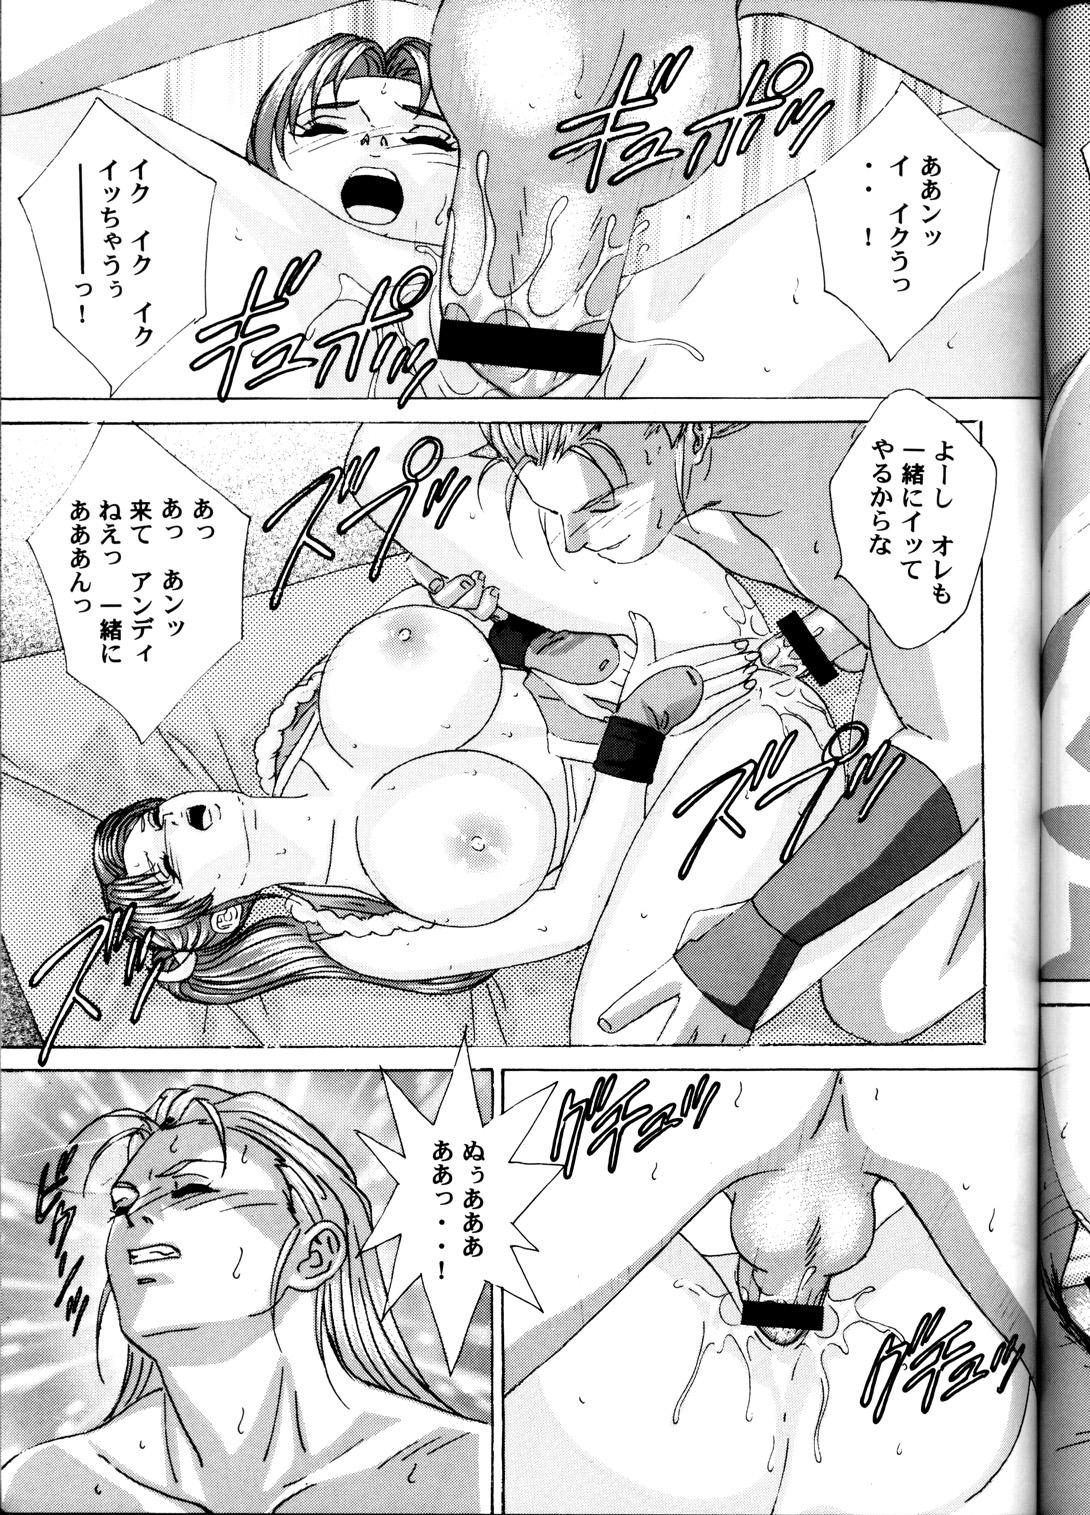 (C60) [D-LOVERS (Nishimaki Tohru)] Mai -Innyuuden- Daiichigou (King of Fighters) 35